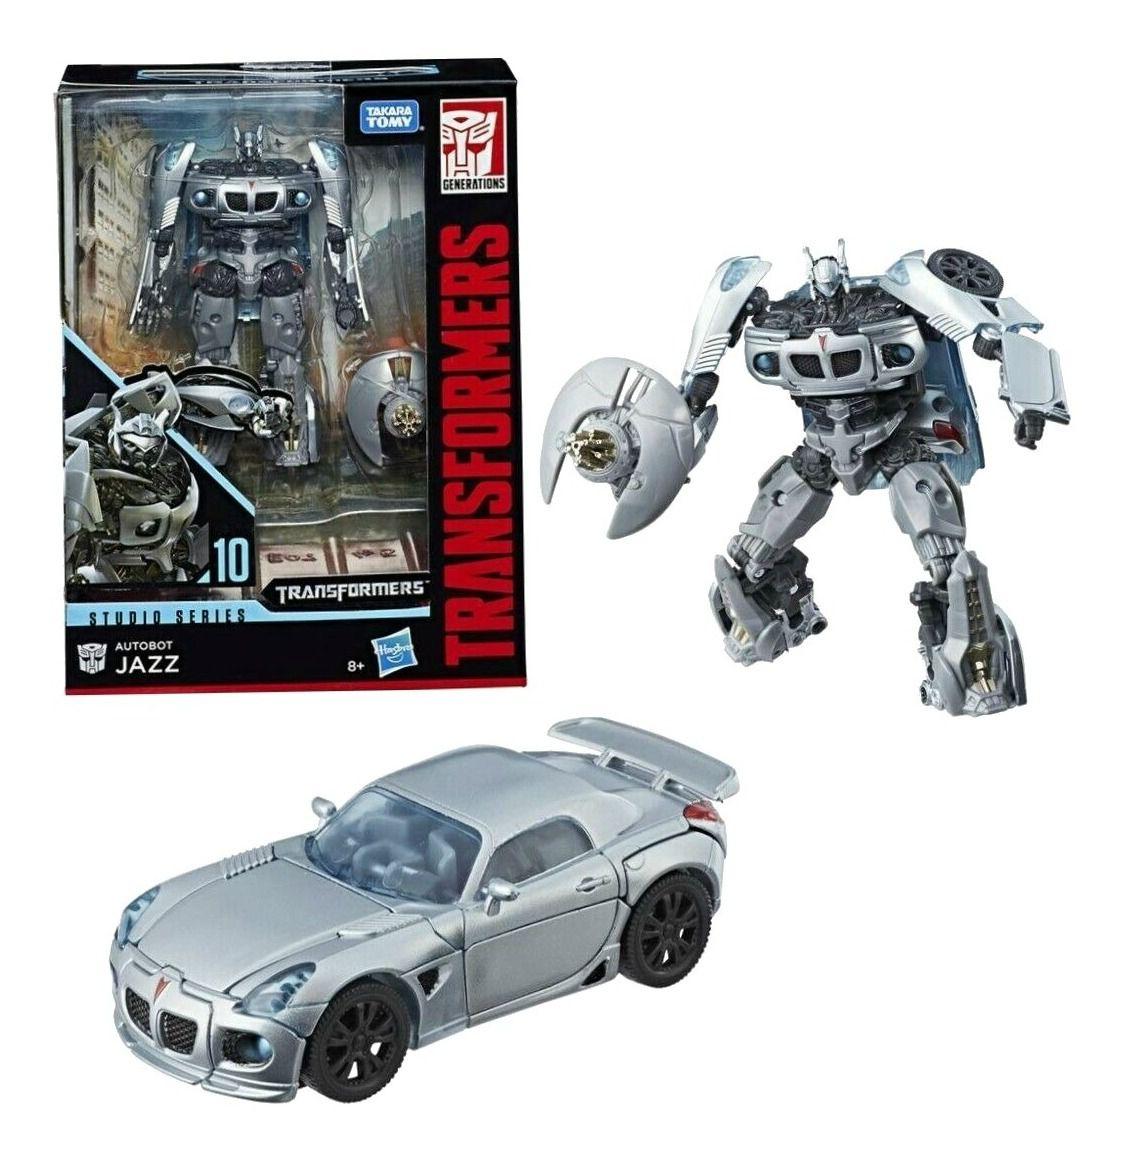 Transformers Studio Series - Autobot Jazz - Hasbro E0701